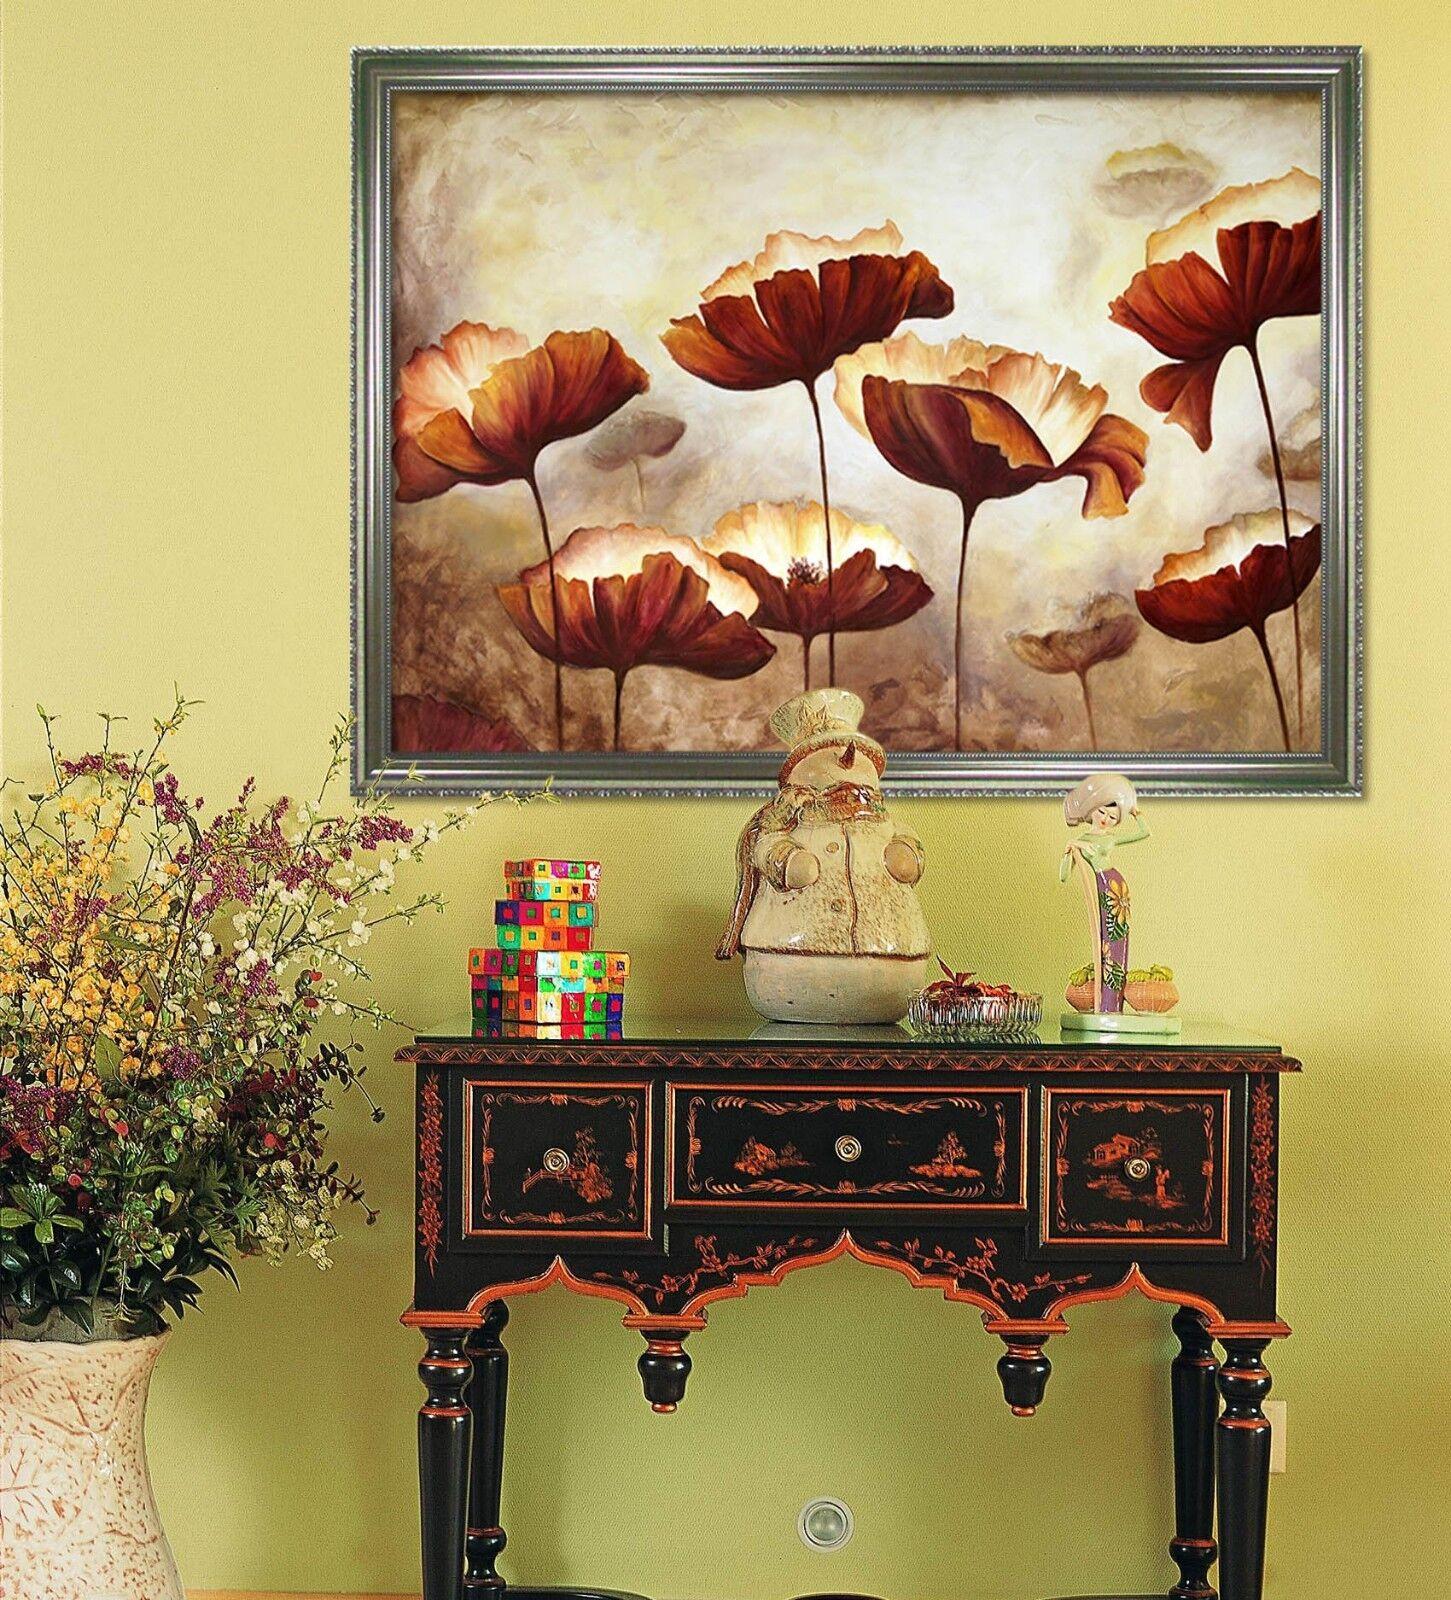 3D Lotus Leaf 566 Fake Framed Poster Home Decor Print Painting Unique Art Summer